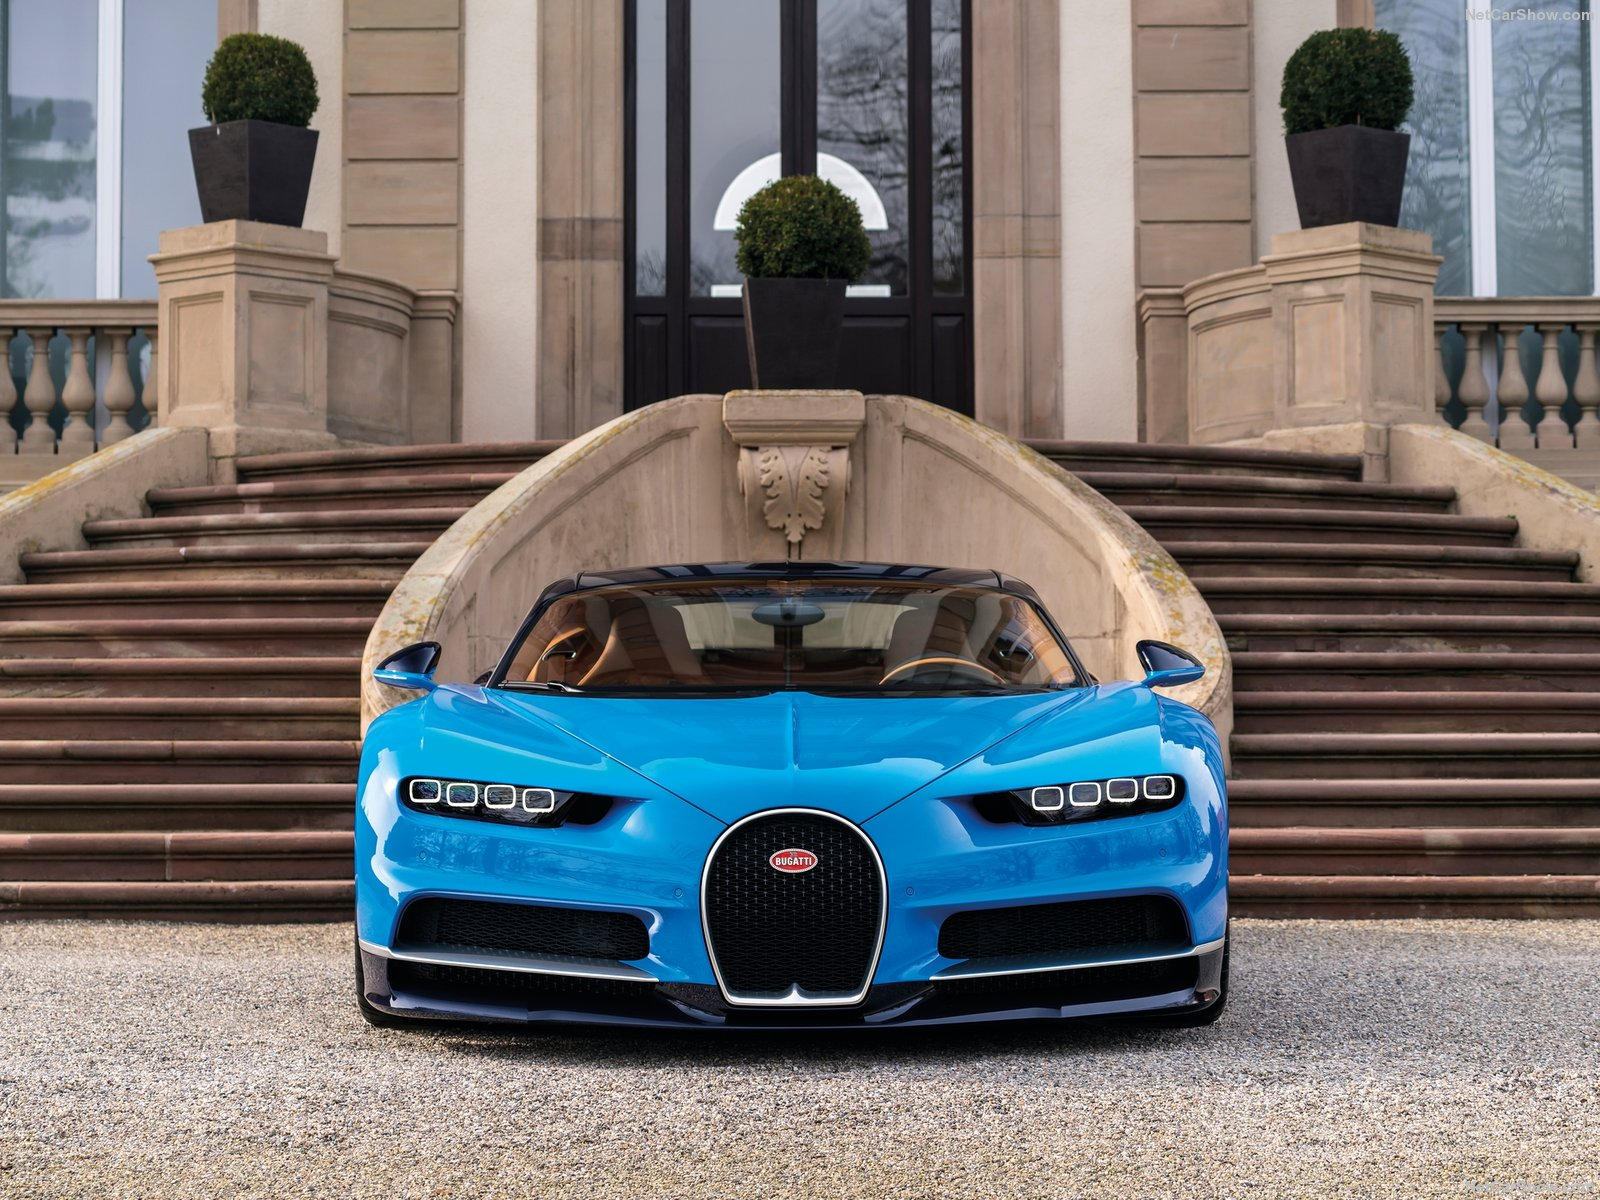 Bugatti-Chiron_2017_1600x1200_wallpaper_21